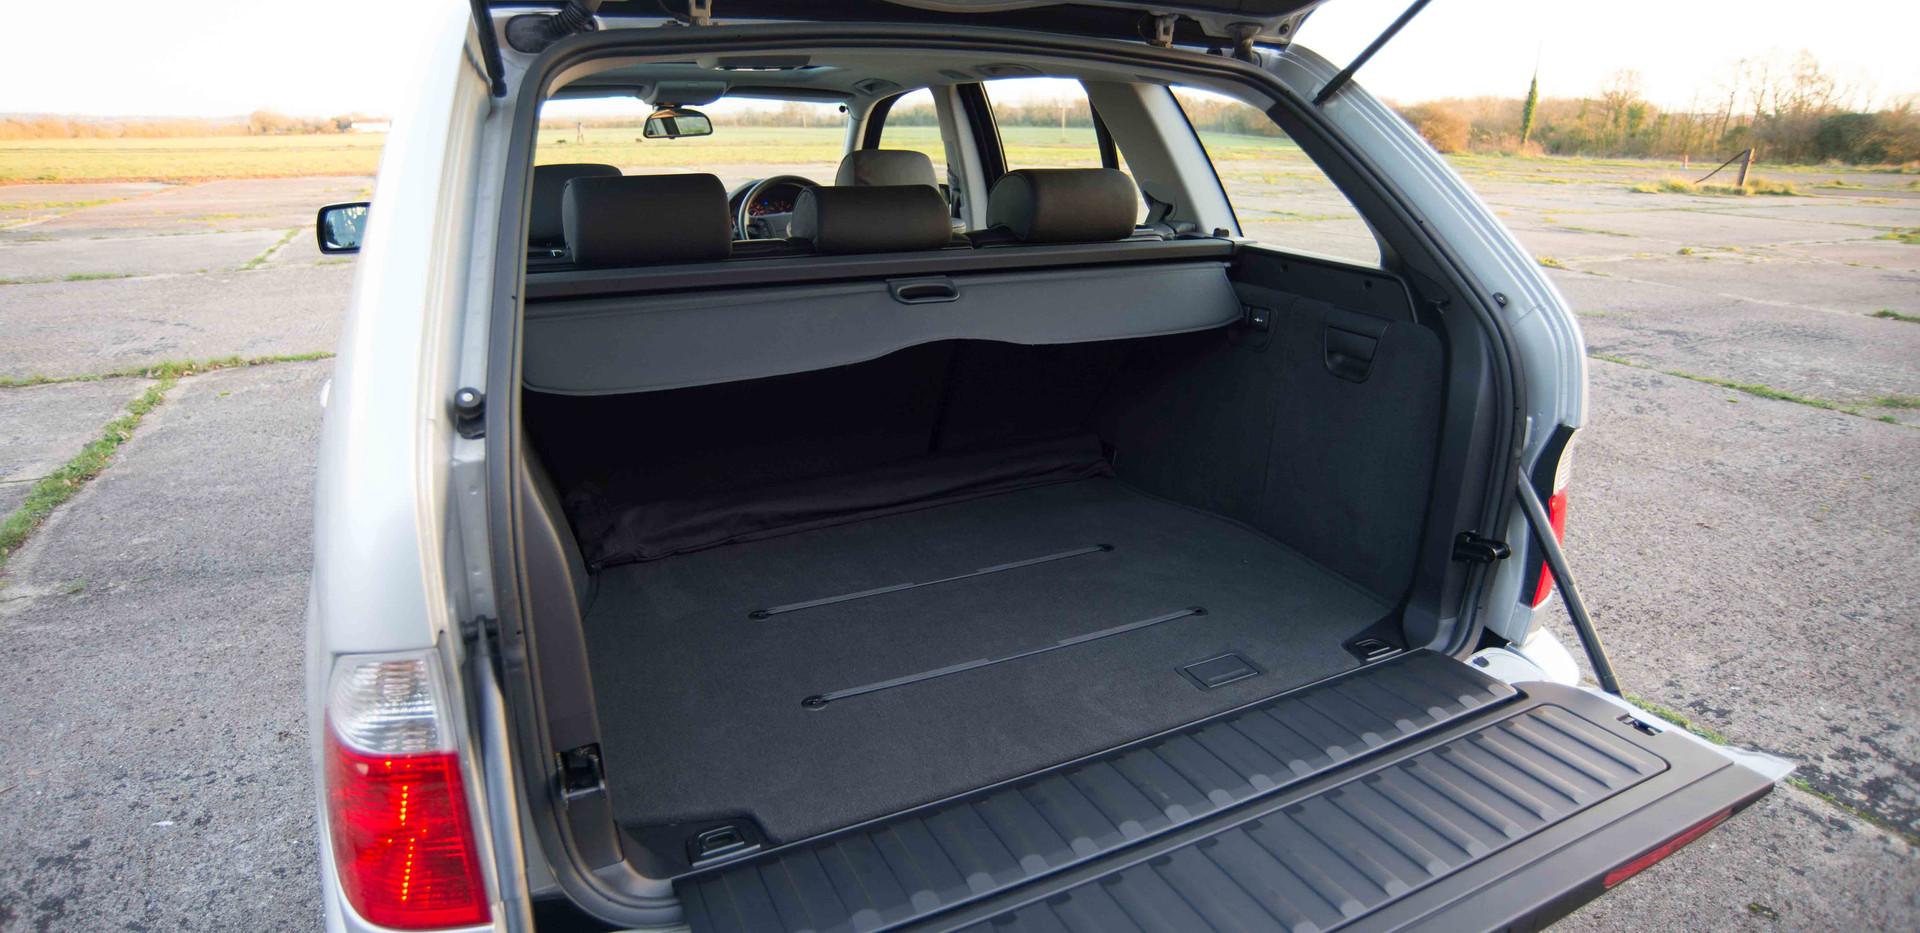 BMW E53 X5 4.4i For Sale UK London  (11